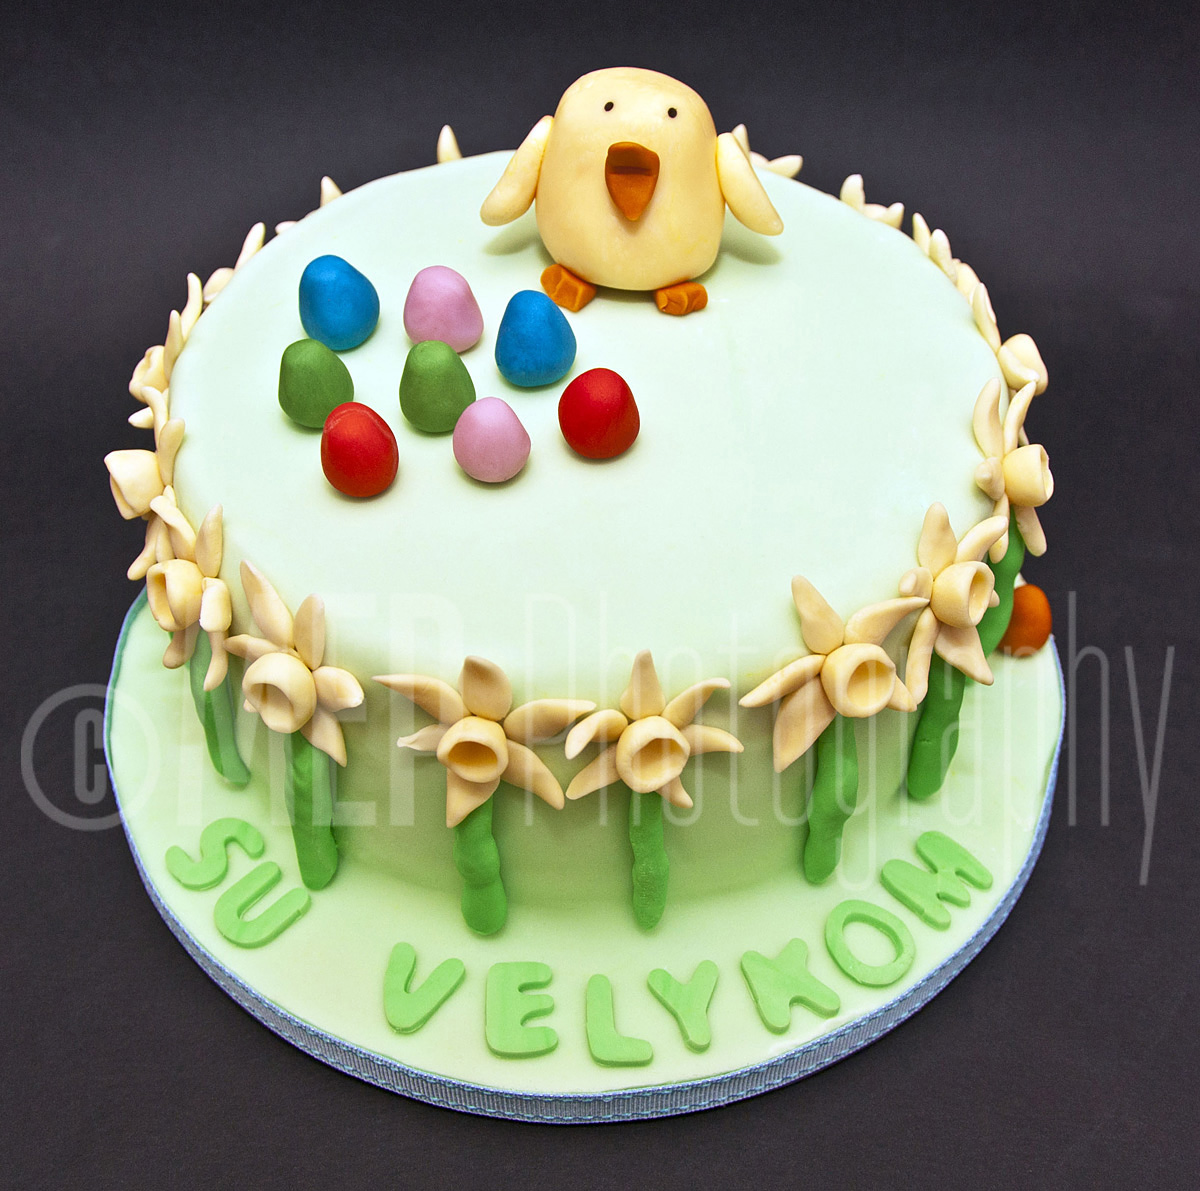 Jen's Cake Mix (5).jpg